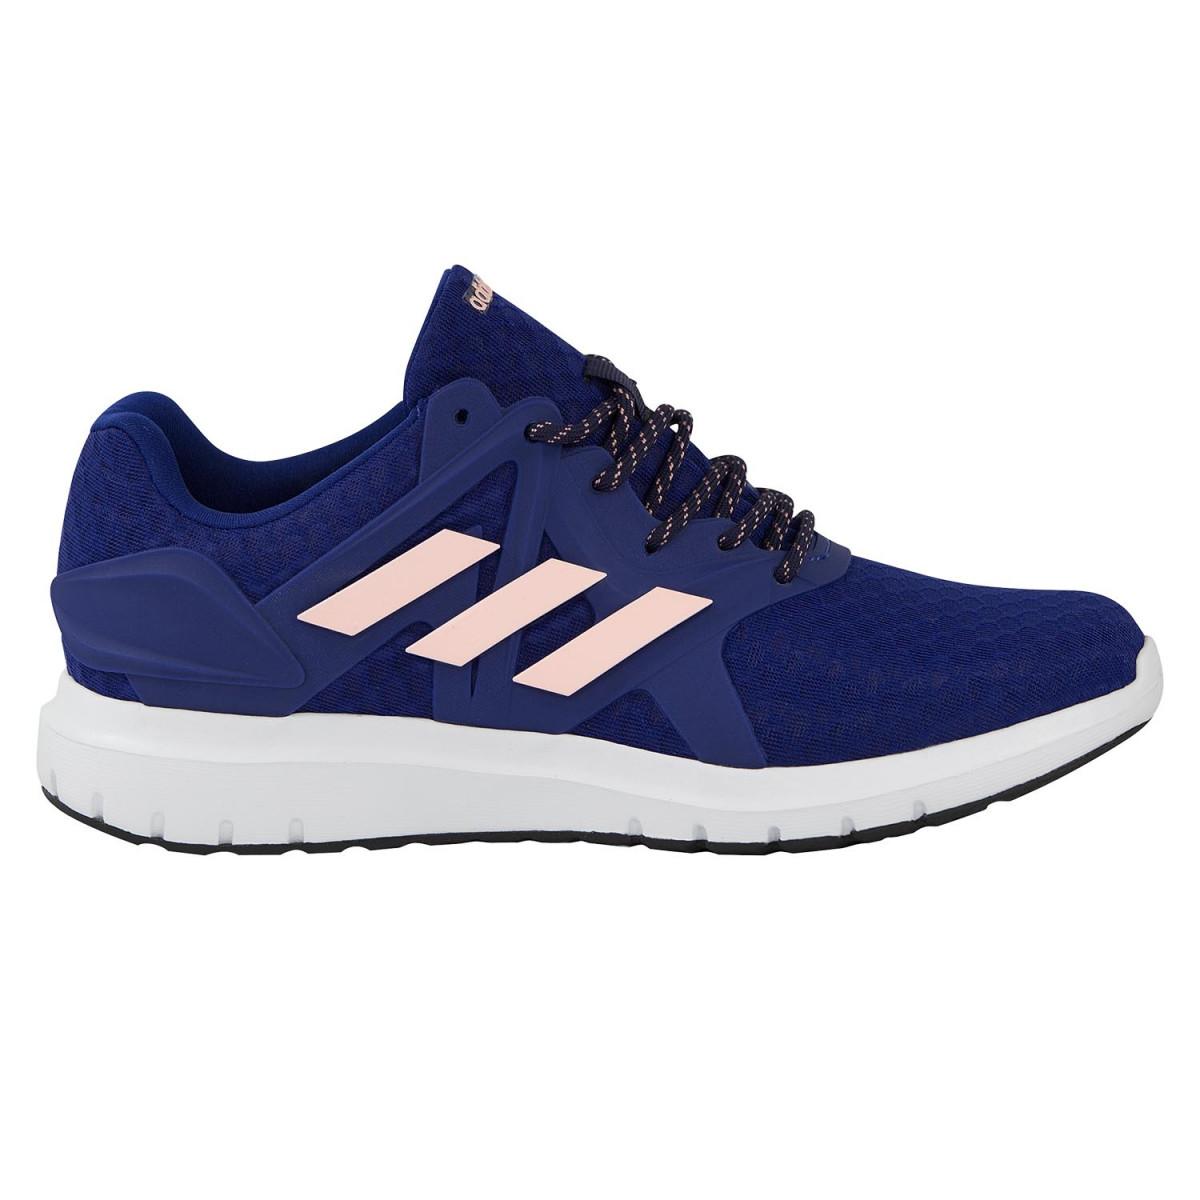 1d06af76b Zapatillas Adidas Starlux - Running - Zapatillas - Mujer